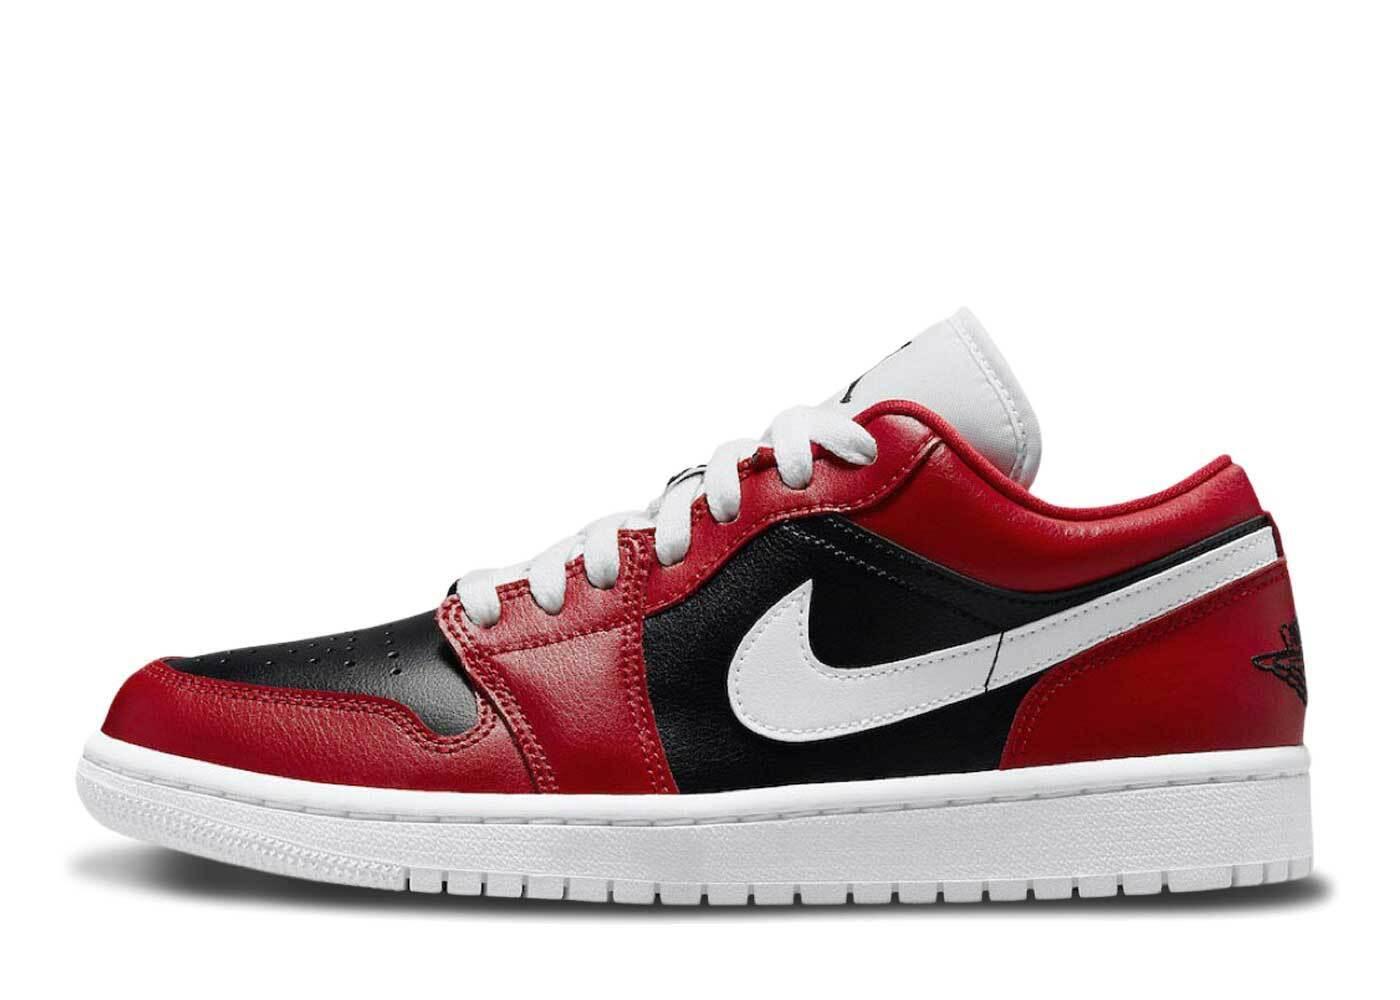 Nike Air Jodan 1 Low Gym Red Womensの写真